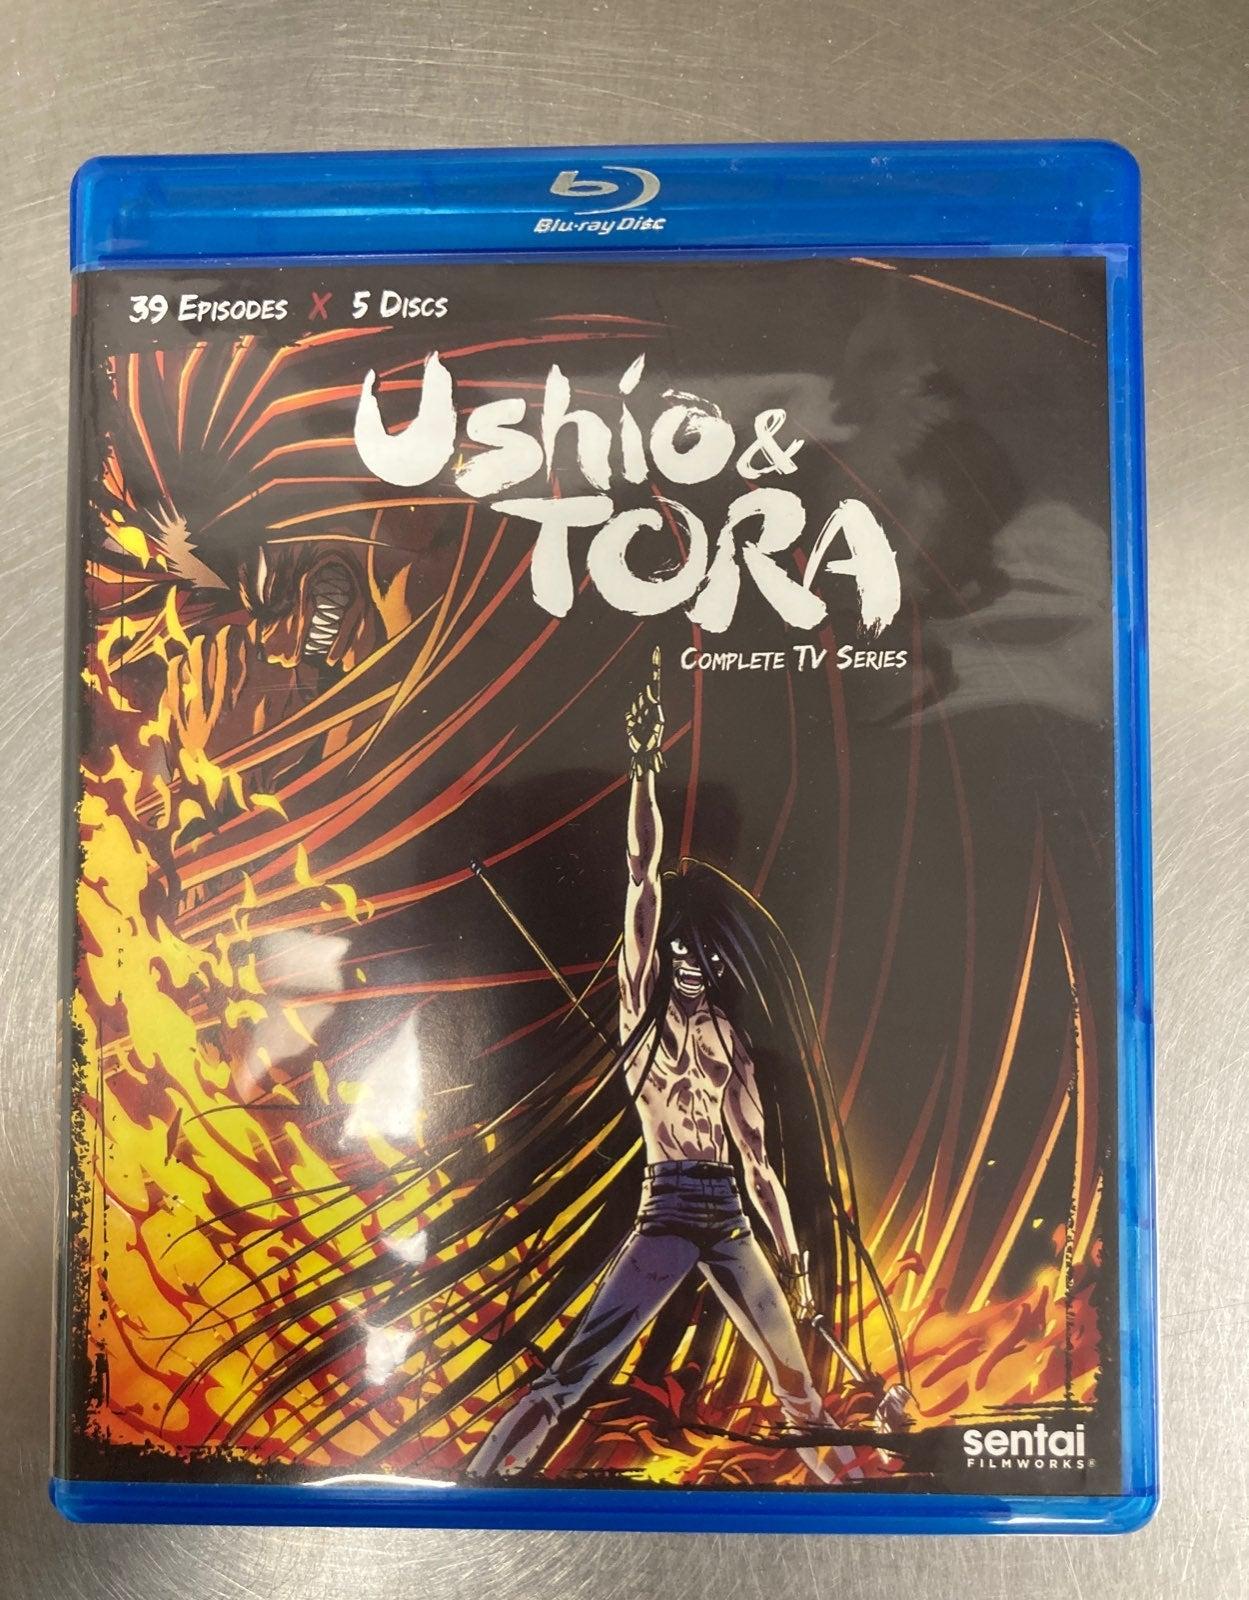 Ushio & Tora Blu Ray Complete TV Series